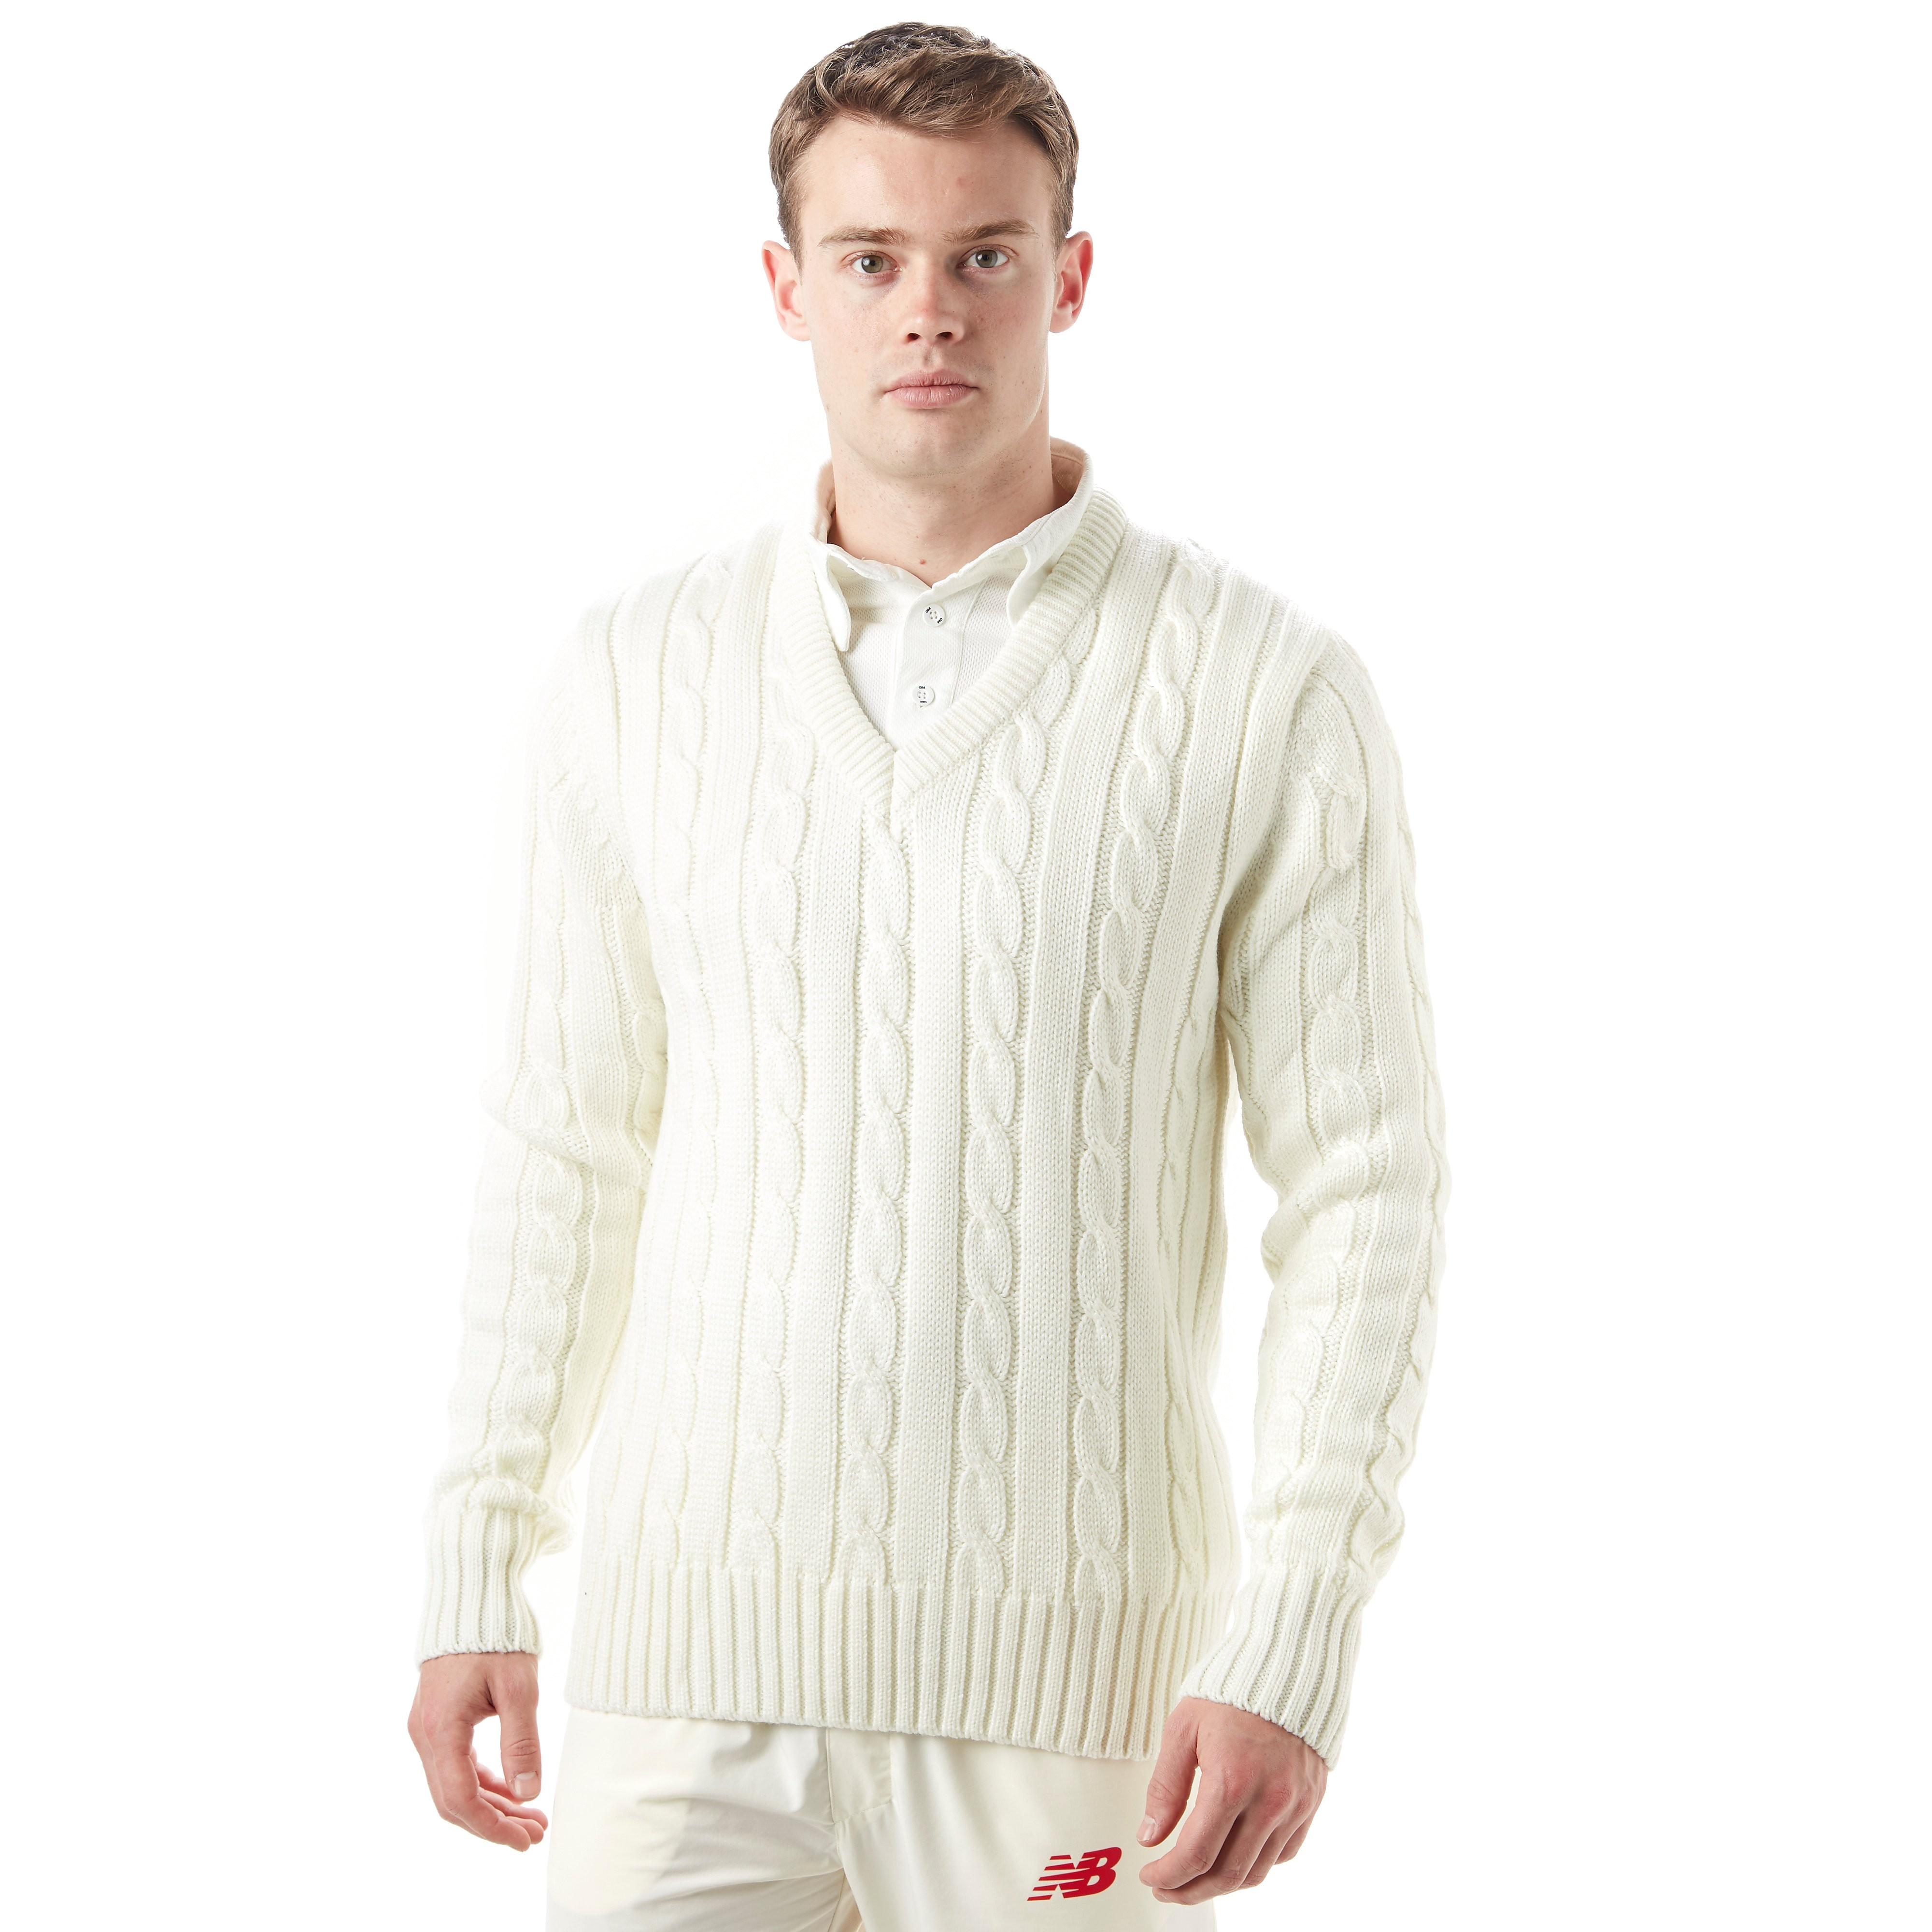 Gunn & Moore Plain Sweater Men's Cricket Top